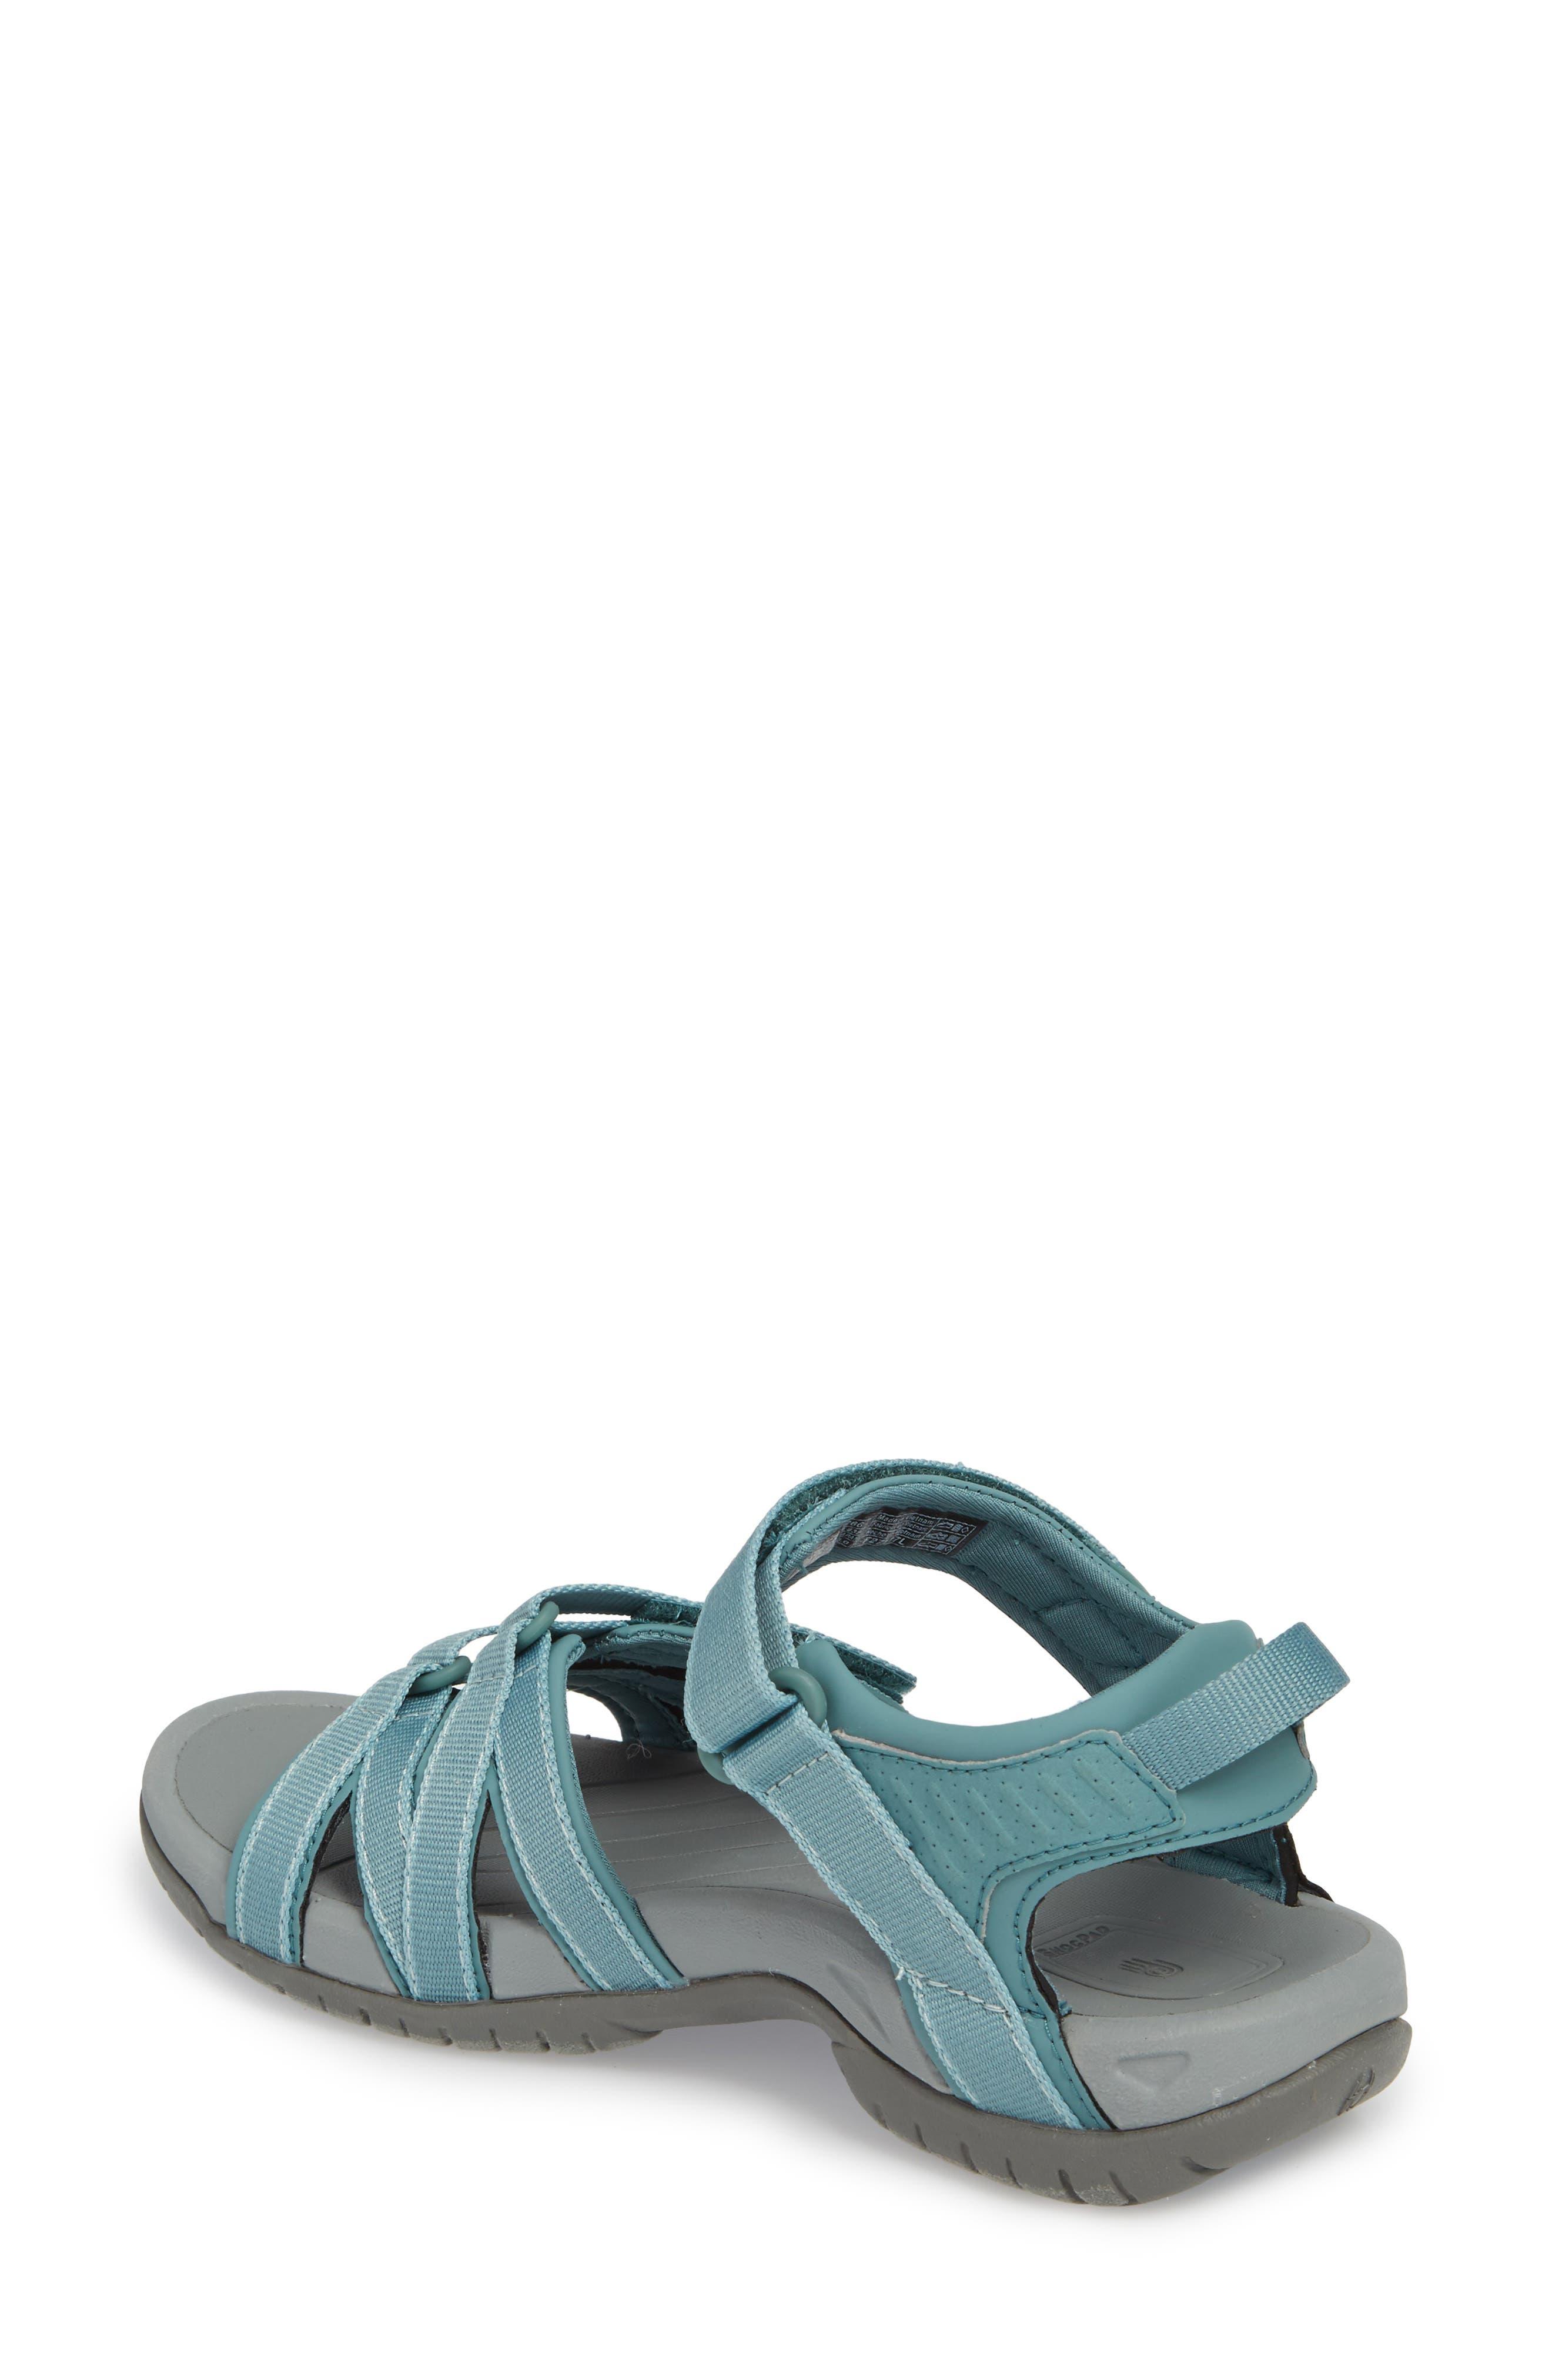 'Tirra' Sandal,                             Alternate thumbnail 2, color,                             North Atlantic